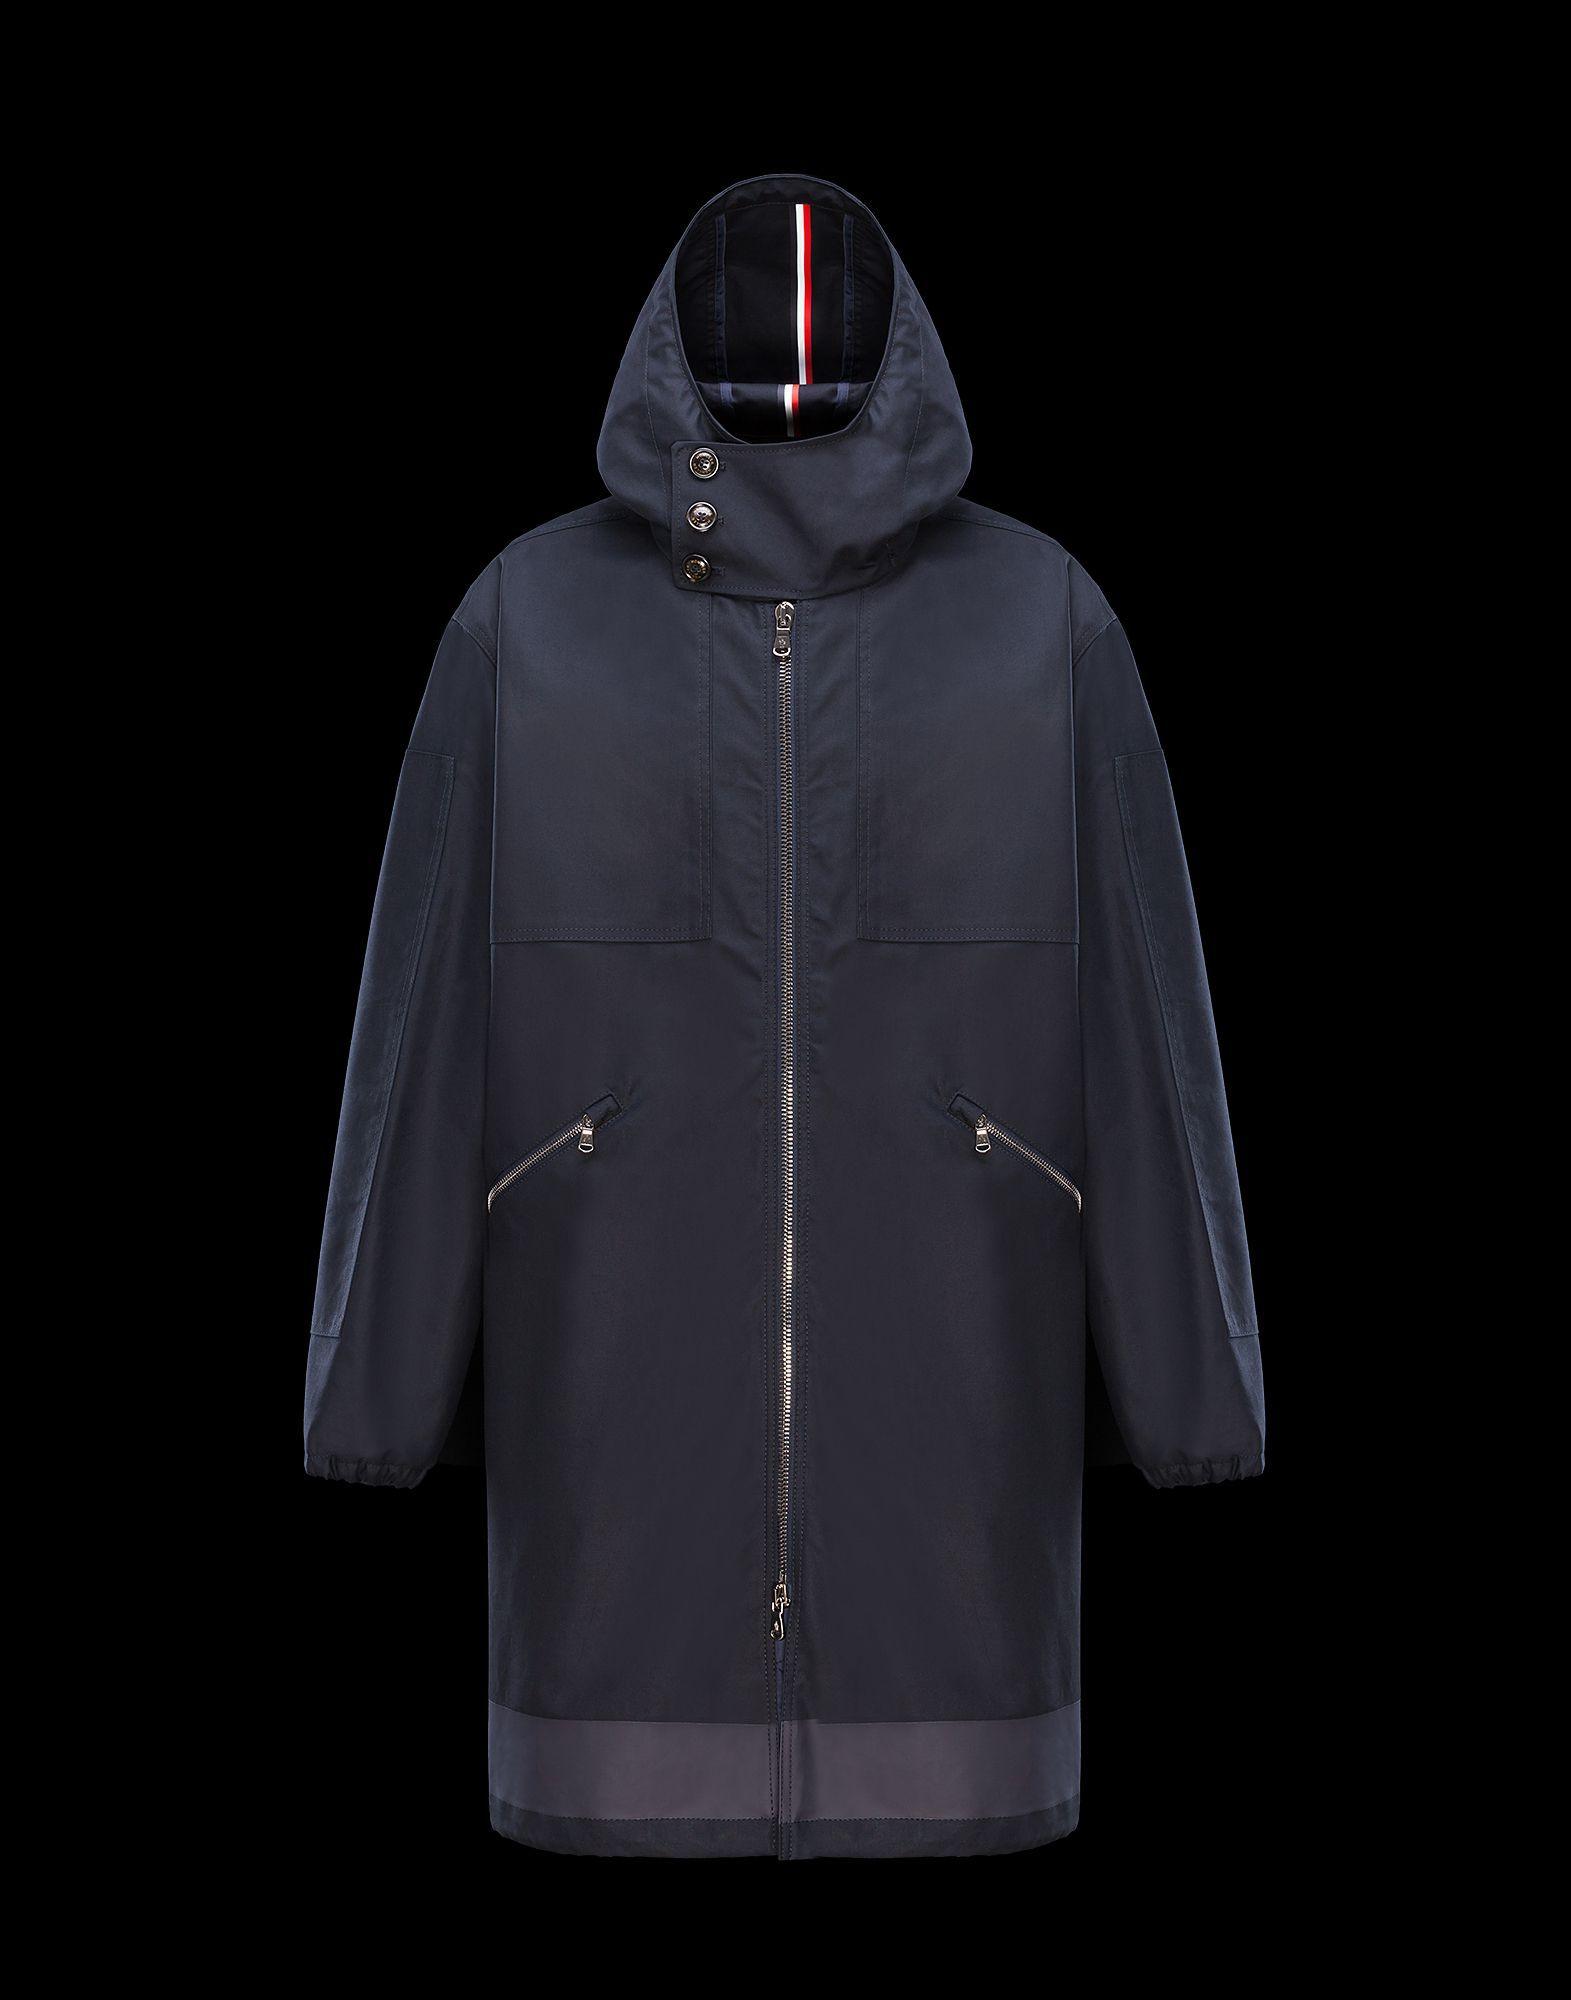 JEAN SIMON in Raincoat for Men Moncler Mens raincoat